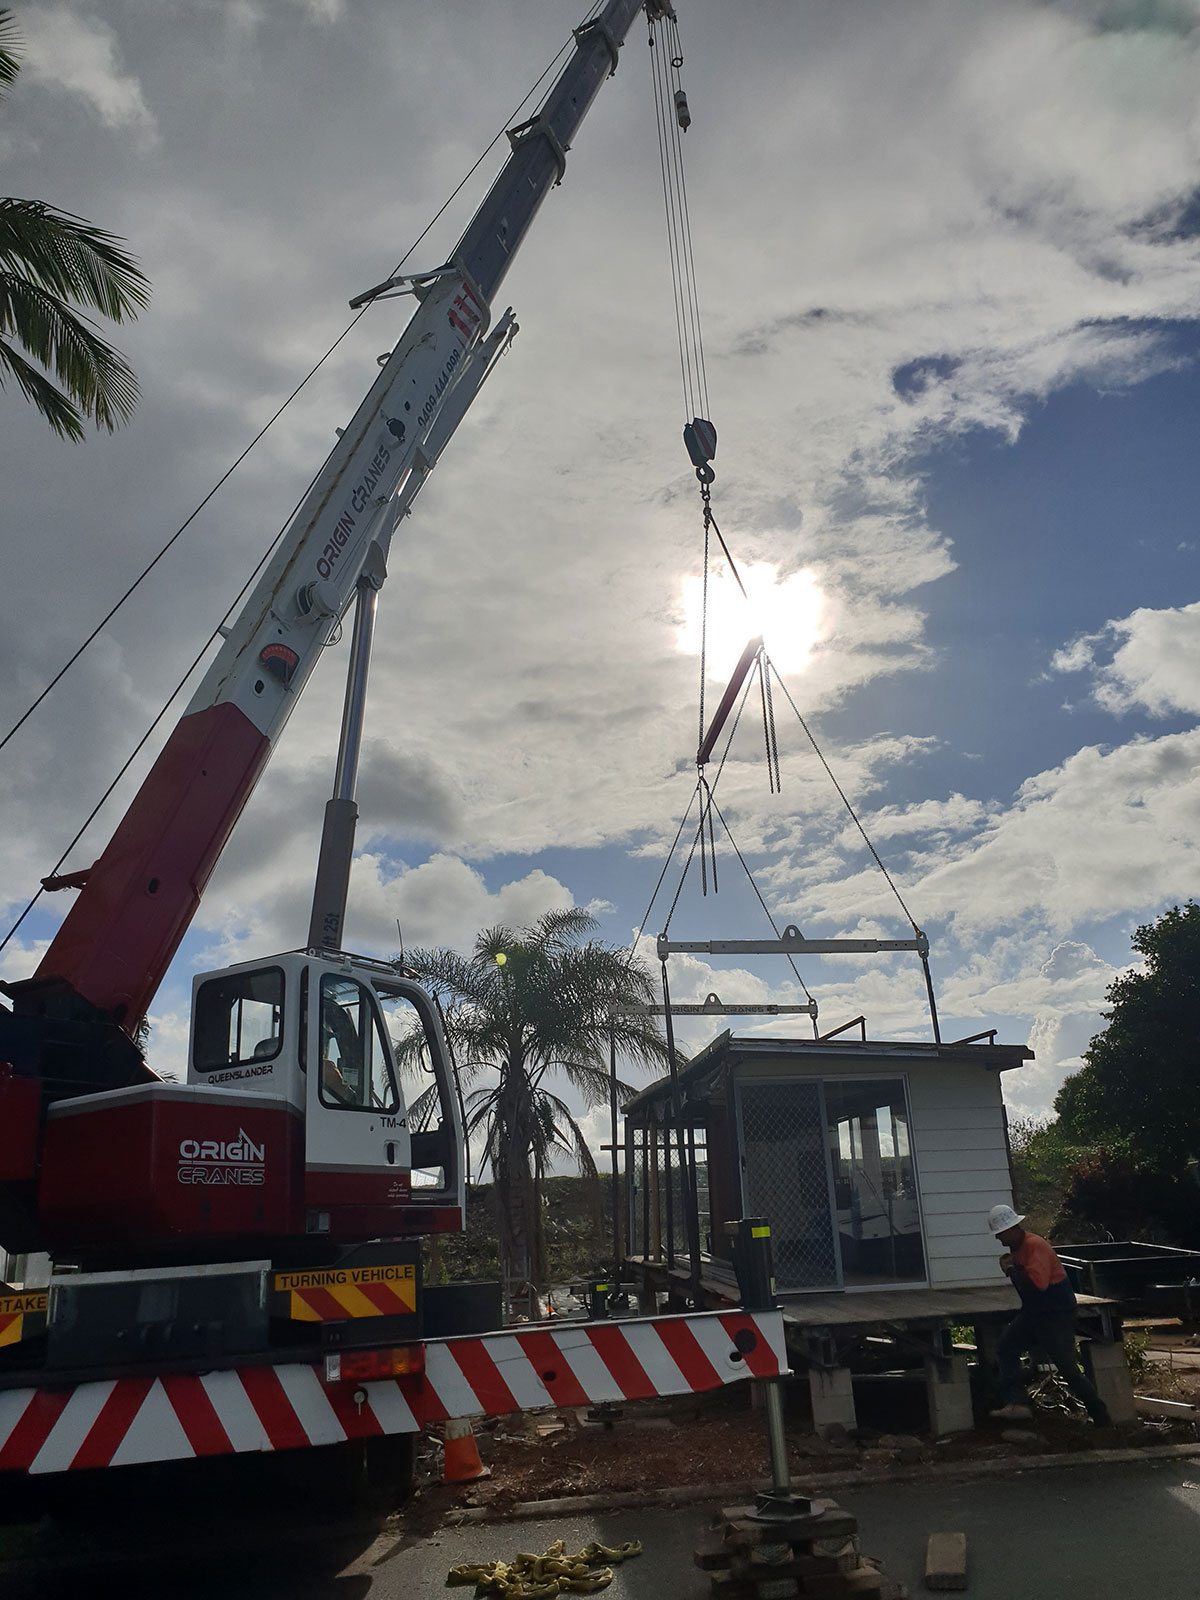 Origin-Cranes-25T-Truck-Mount-Slew-Crane-Sunshine-Coast